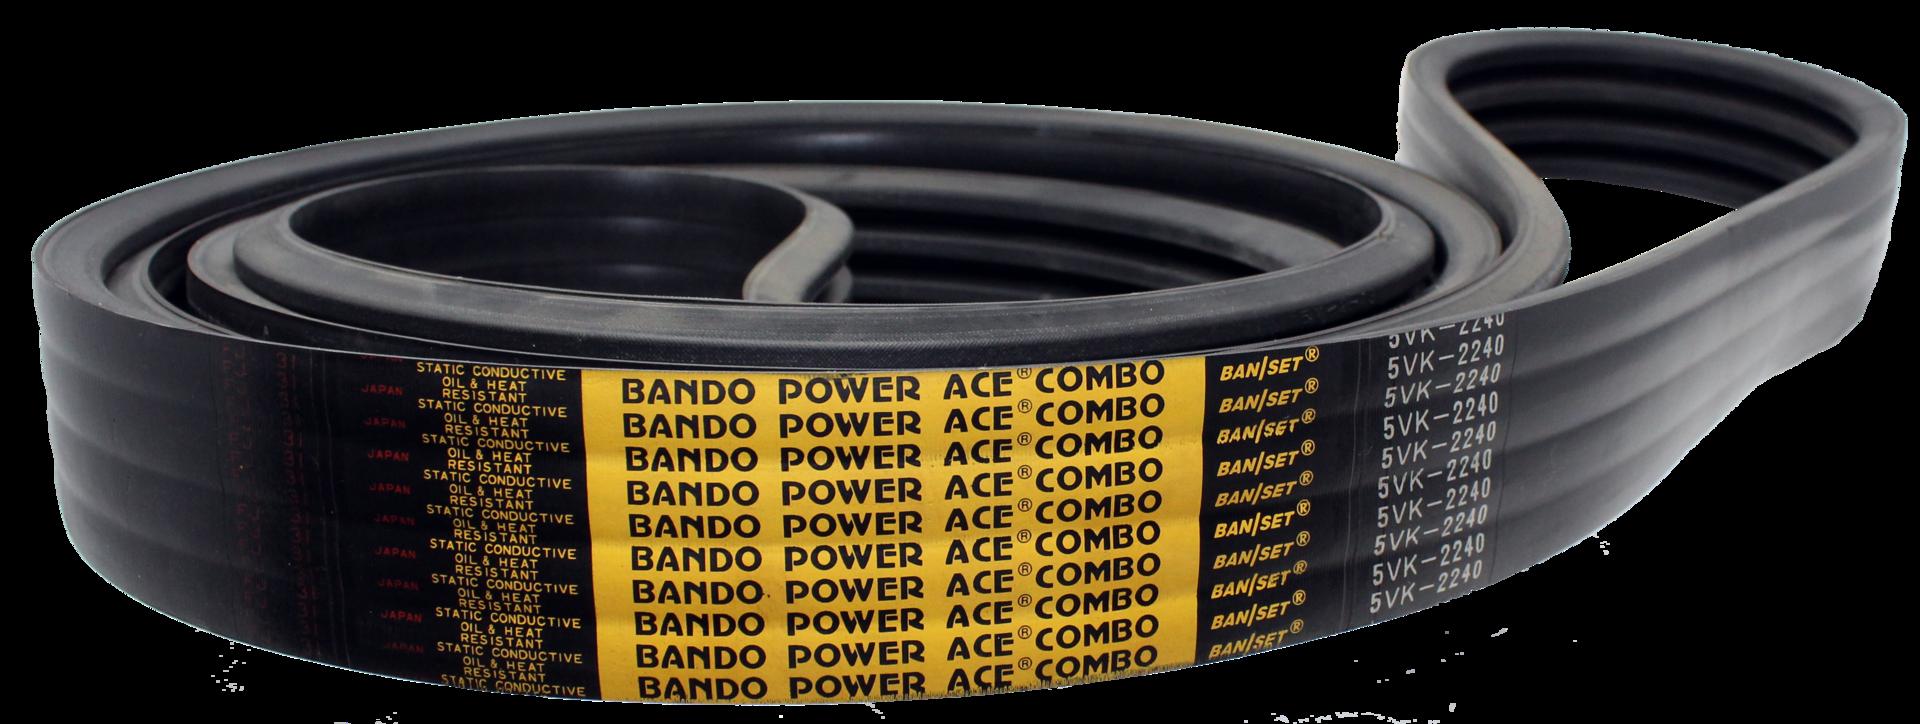 Power Ace® Aramid Combo (5VK, 8VK)